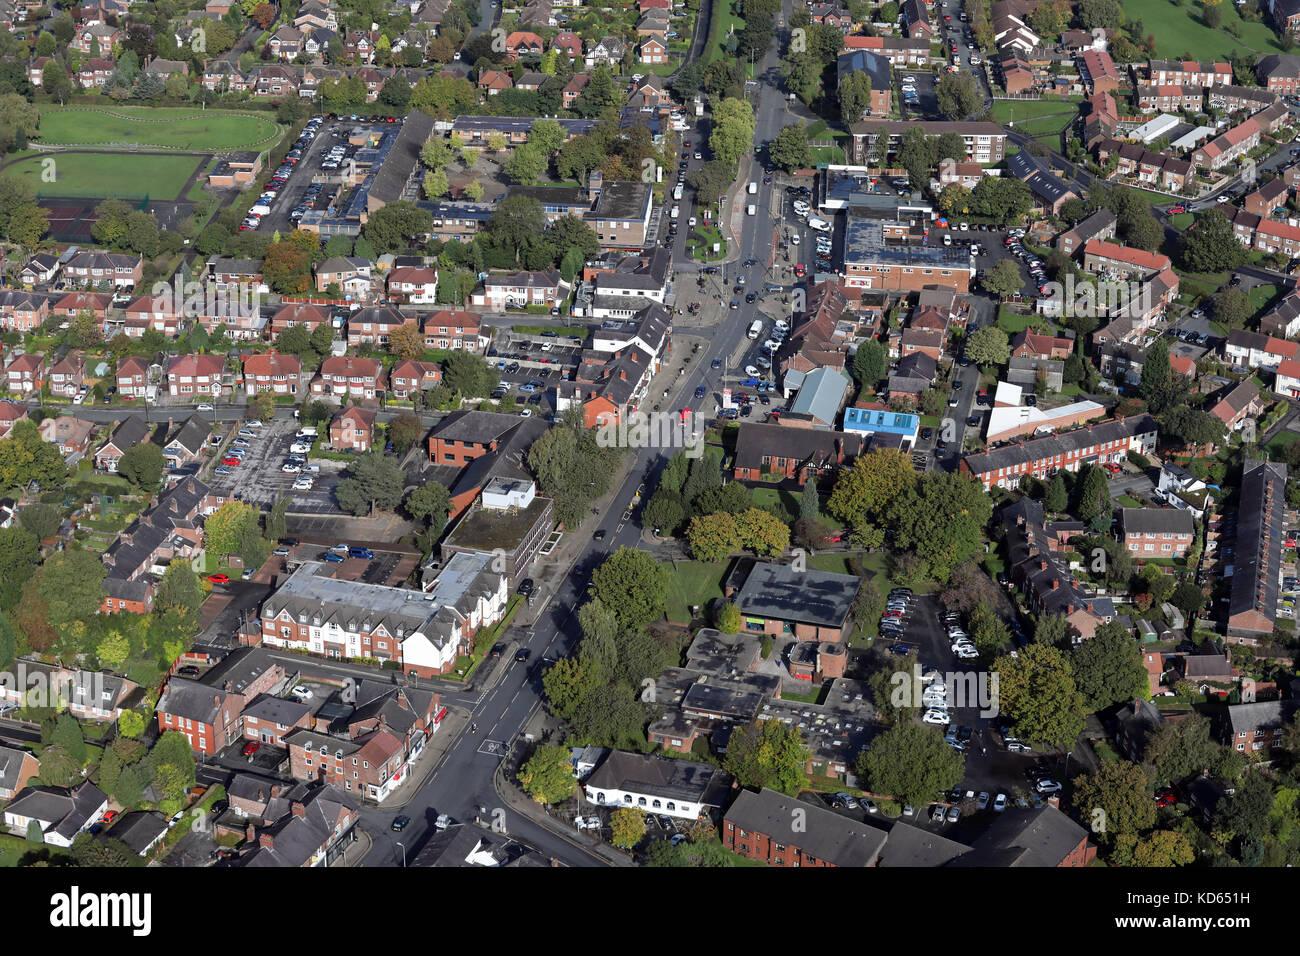 aerial view of Handforth village, Cheshire, UK - Stock Image